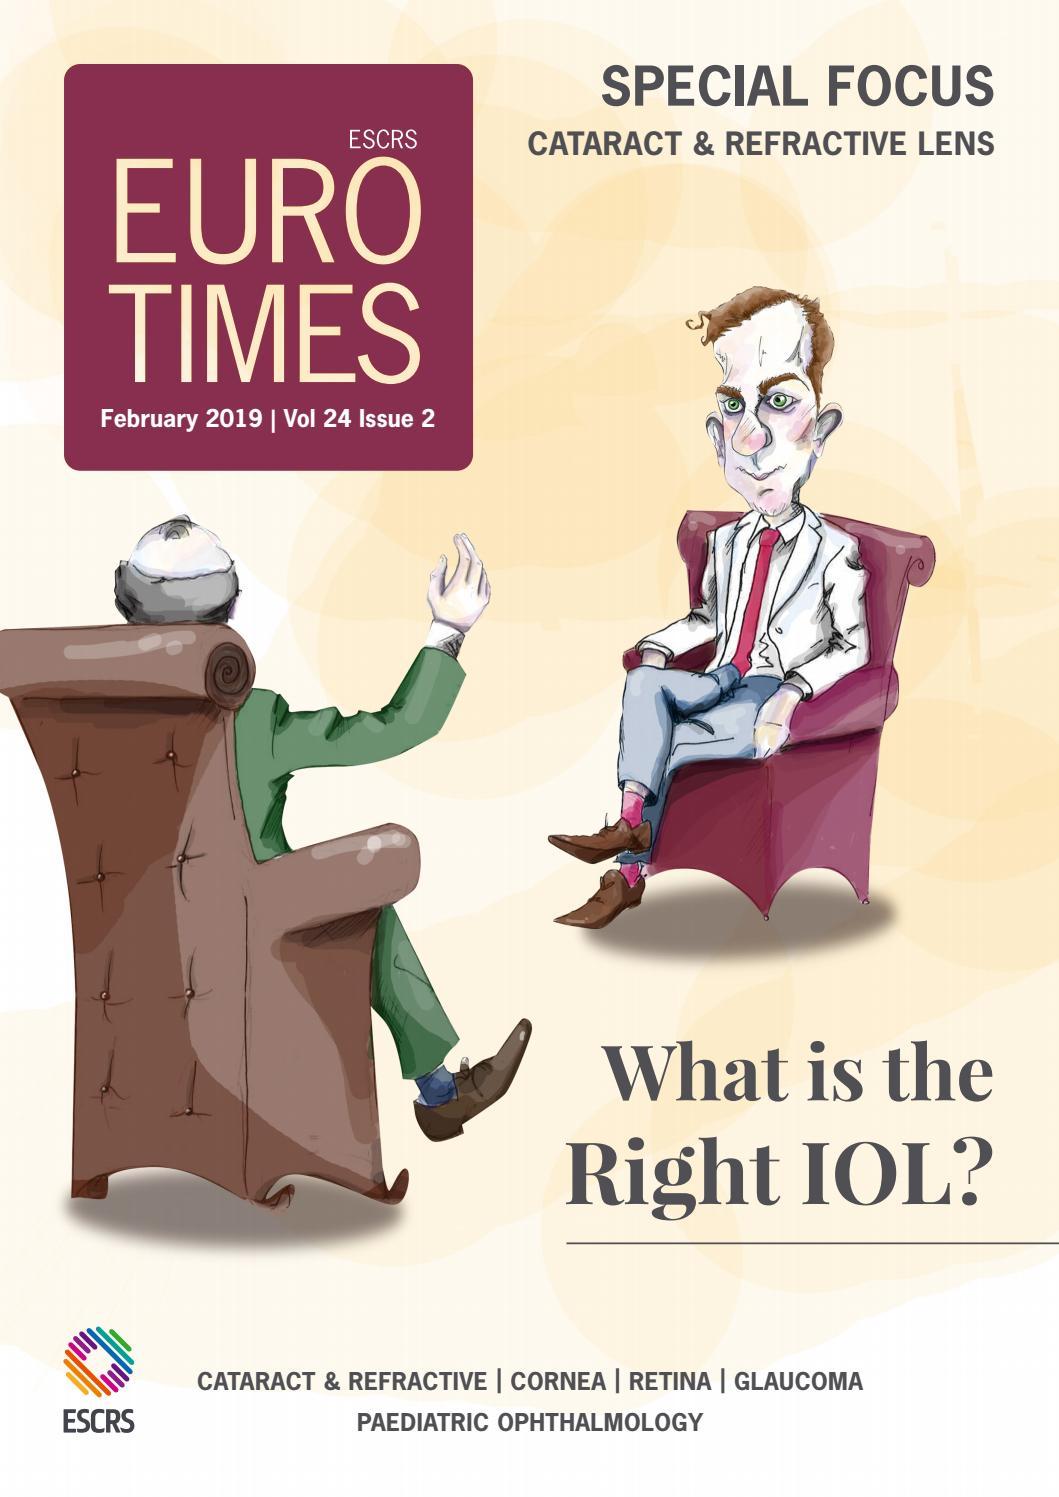 EuroTimes Vol 24 Issue 2 Jan 2019 by EUROTIMES - issuu